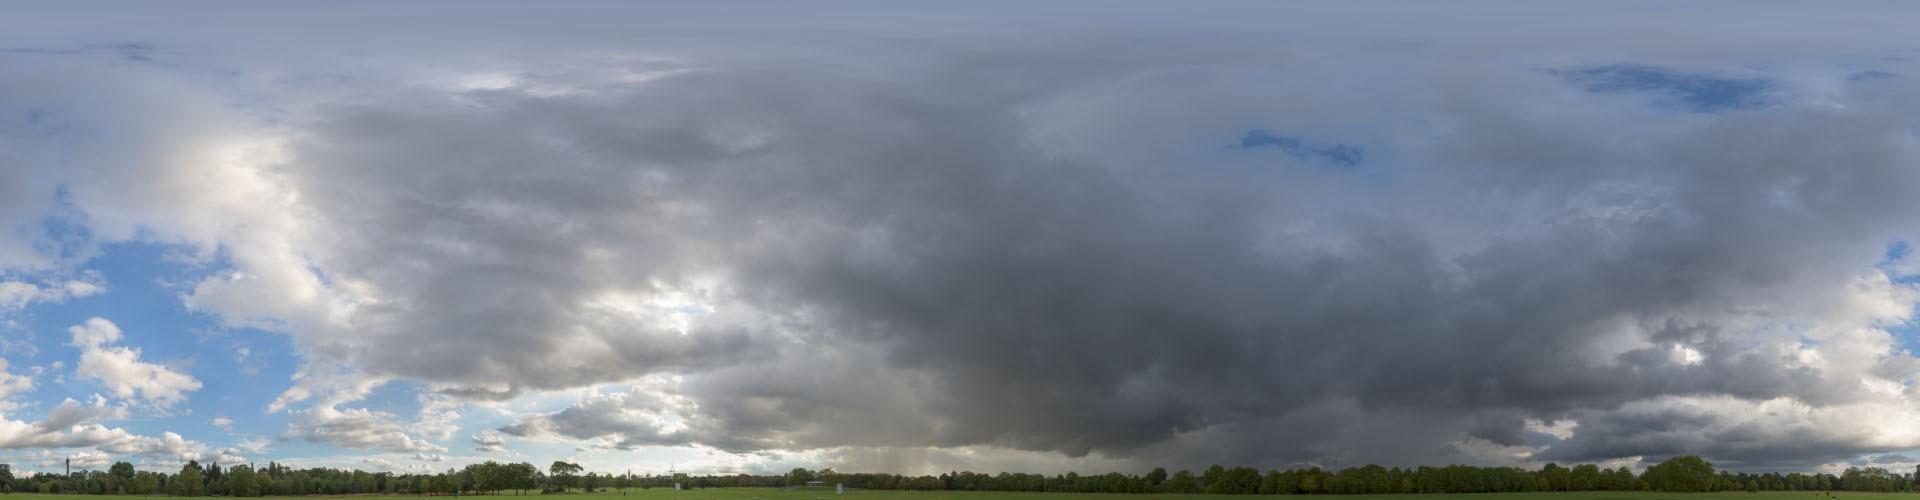 Rainy Clouds 2222 (58k)